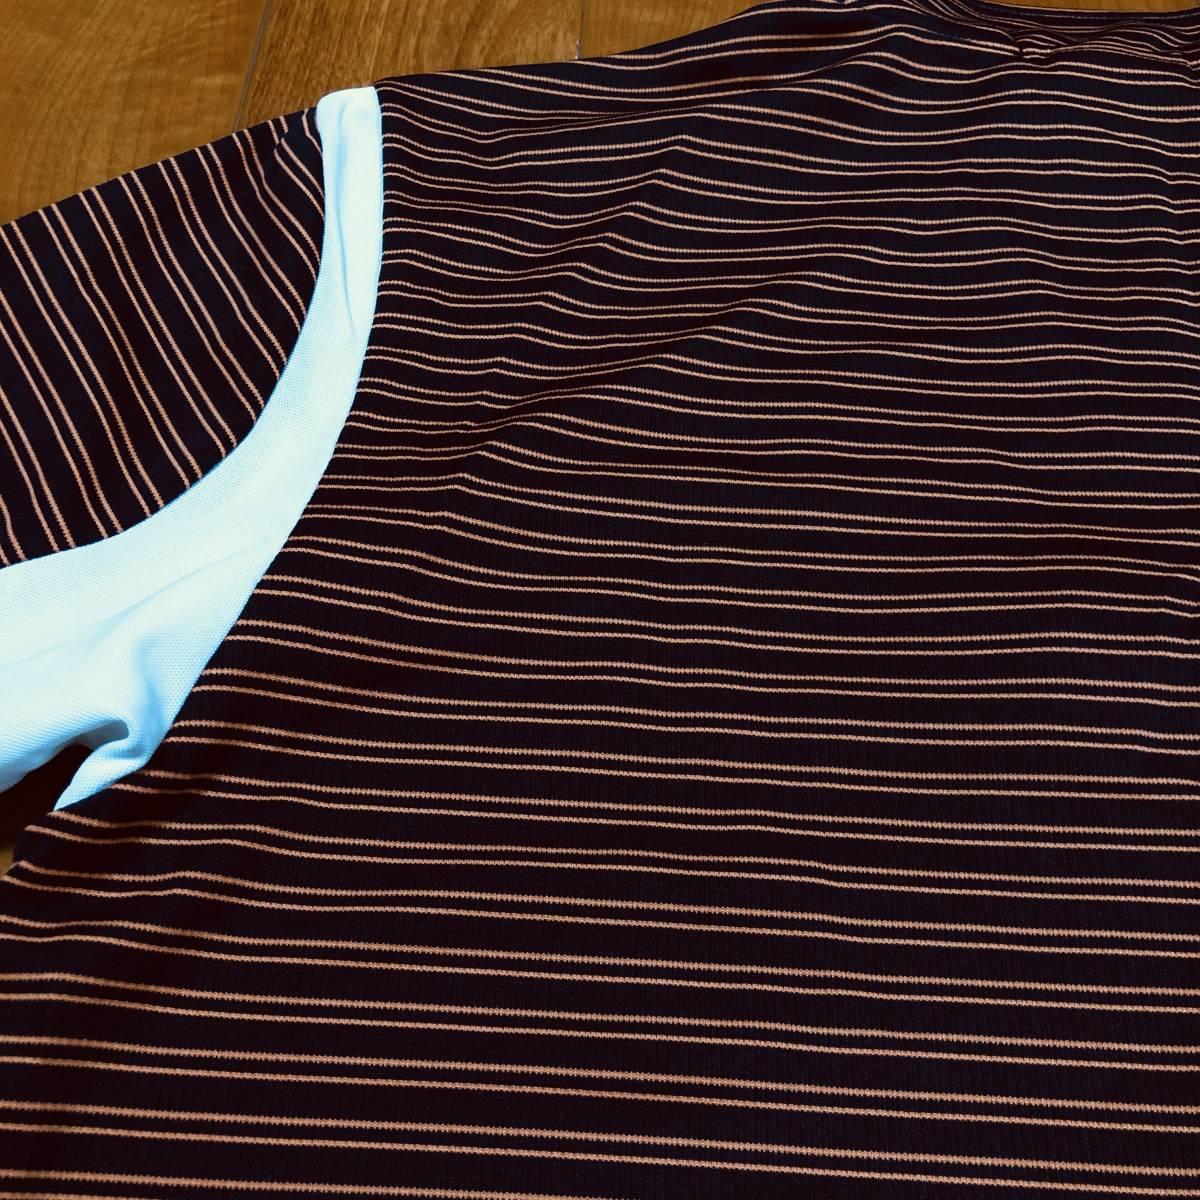 【le coq sportif golf】 ルコック ゴルフ ゴルフウェア 半袖 ハーフジップ ポロシャツ メンズ Mサイズ 美品!_画像5